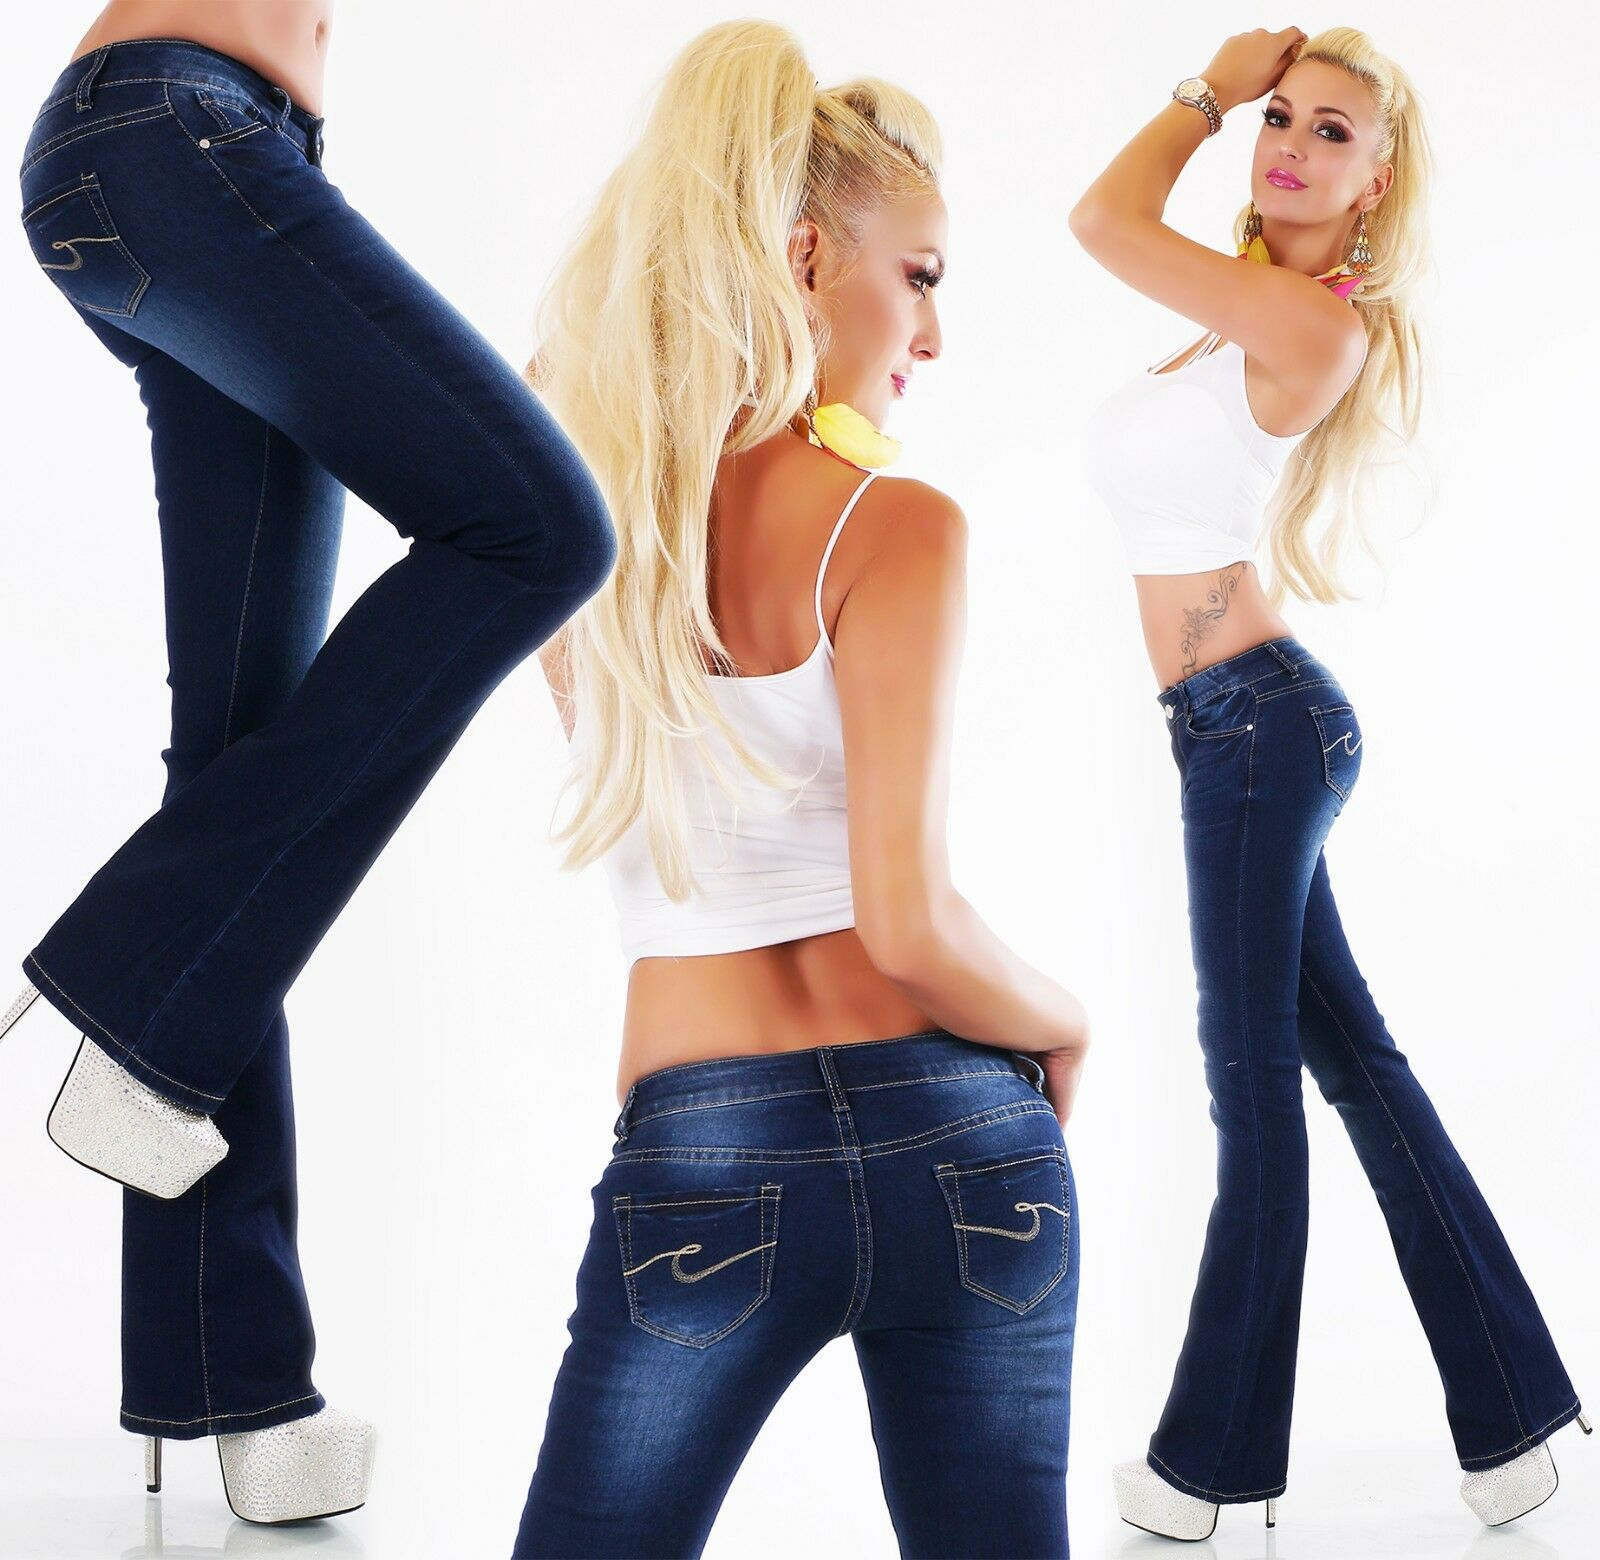 Bootcut Women's Jeans Trousers Flare Low-Rise bluee Denim Xs S M L XL